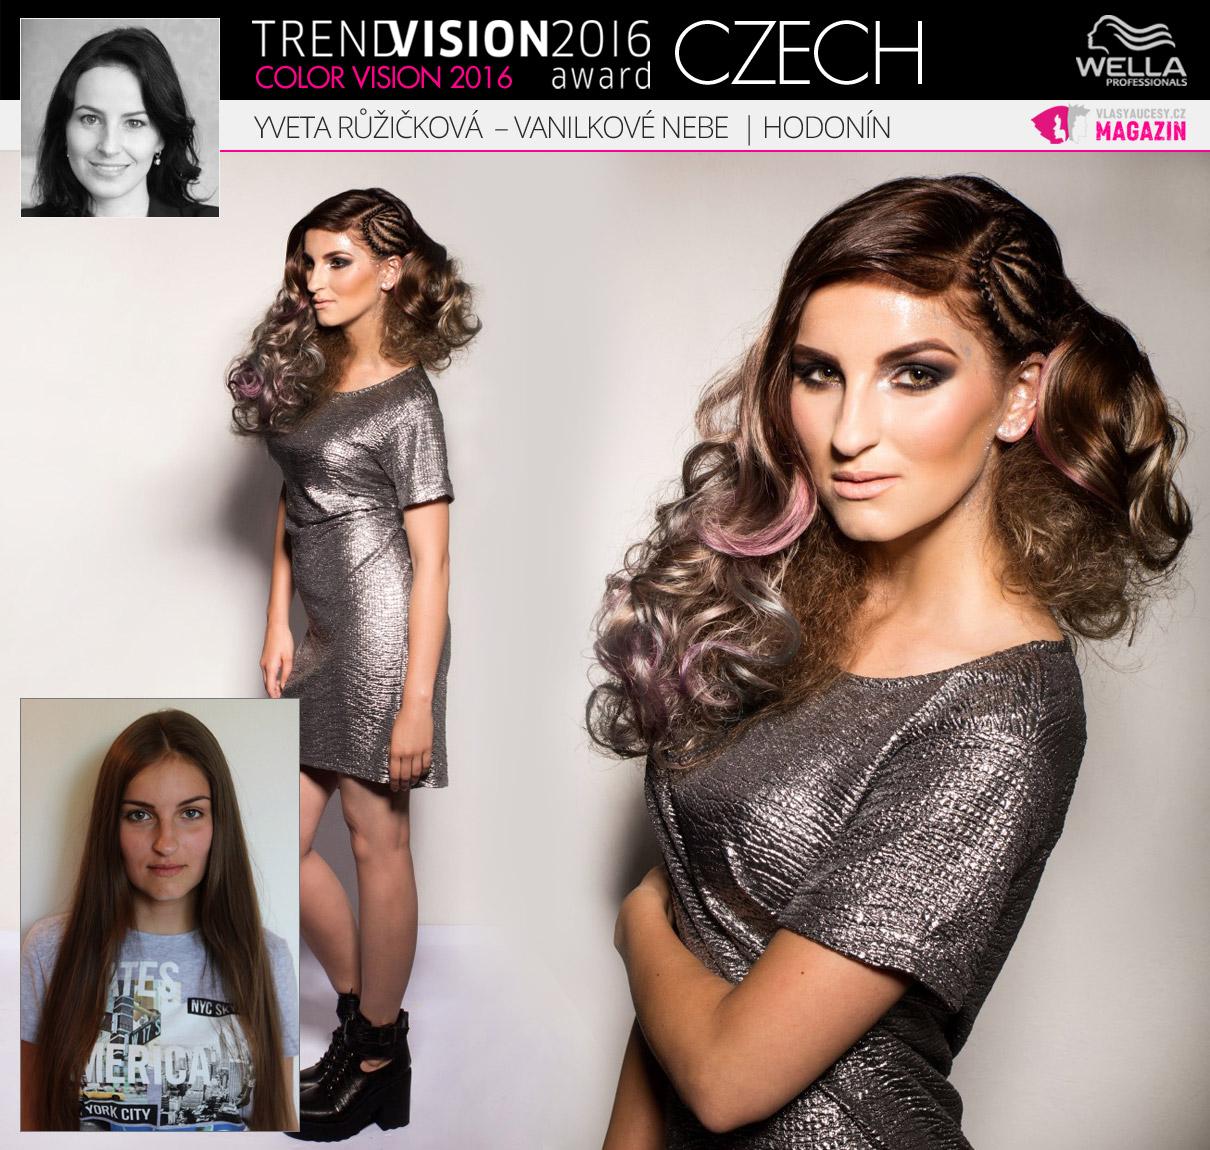 Yveta Růžičková, Vanilkové nebe, Hodonín –Wella Professionals Trend Vision Award Česká republika, kategorie Color Vision 2016.